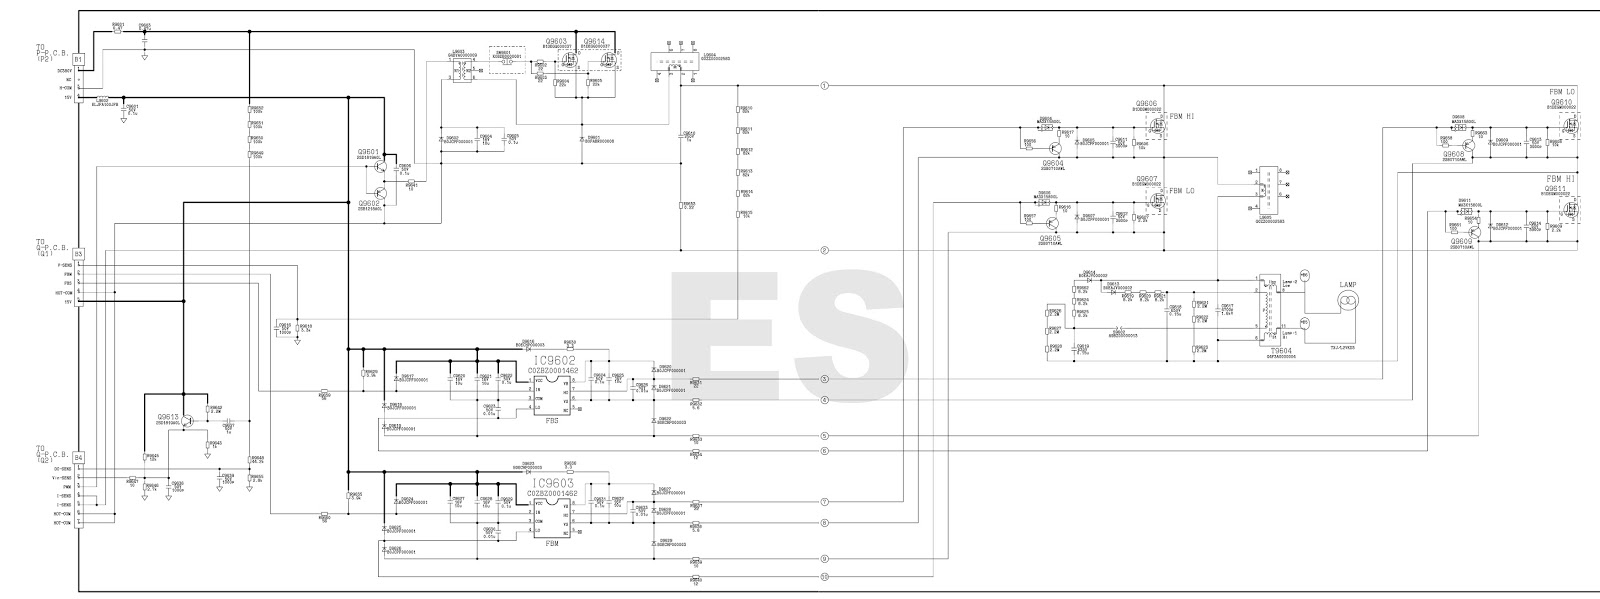 electronic equipment repair centre   panasonic pt-ax100 ext option - self check mode